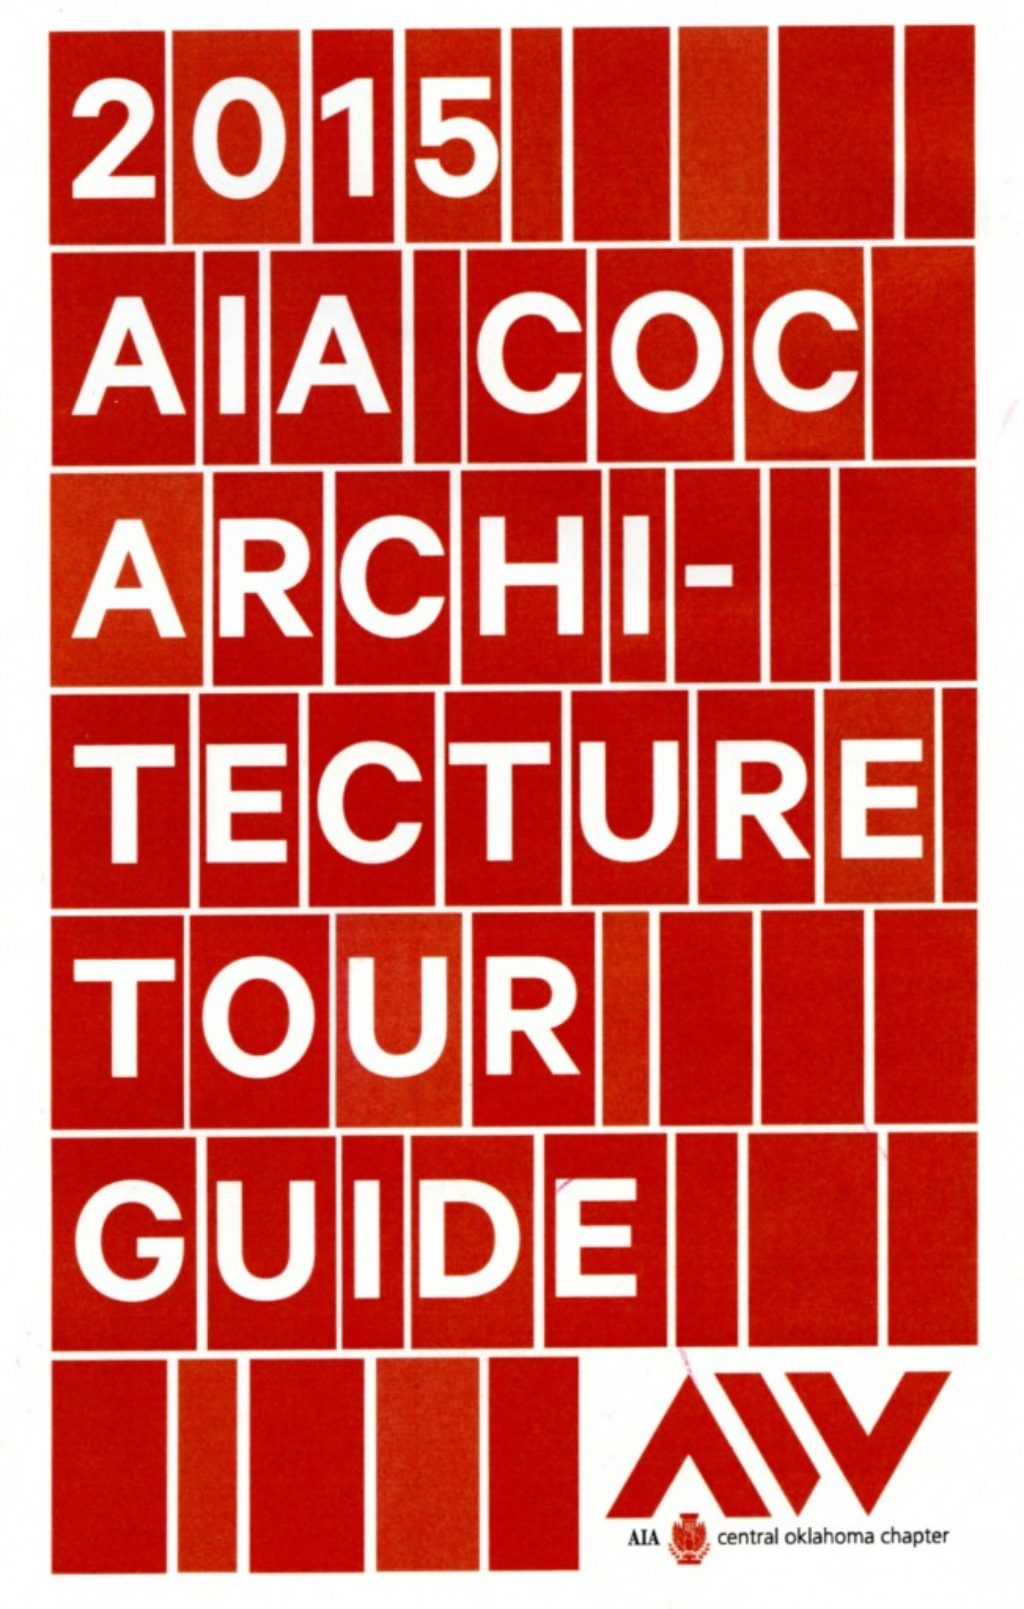 aia 2015 tour guide